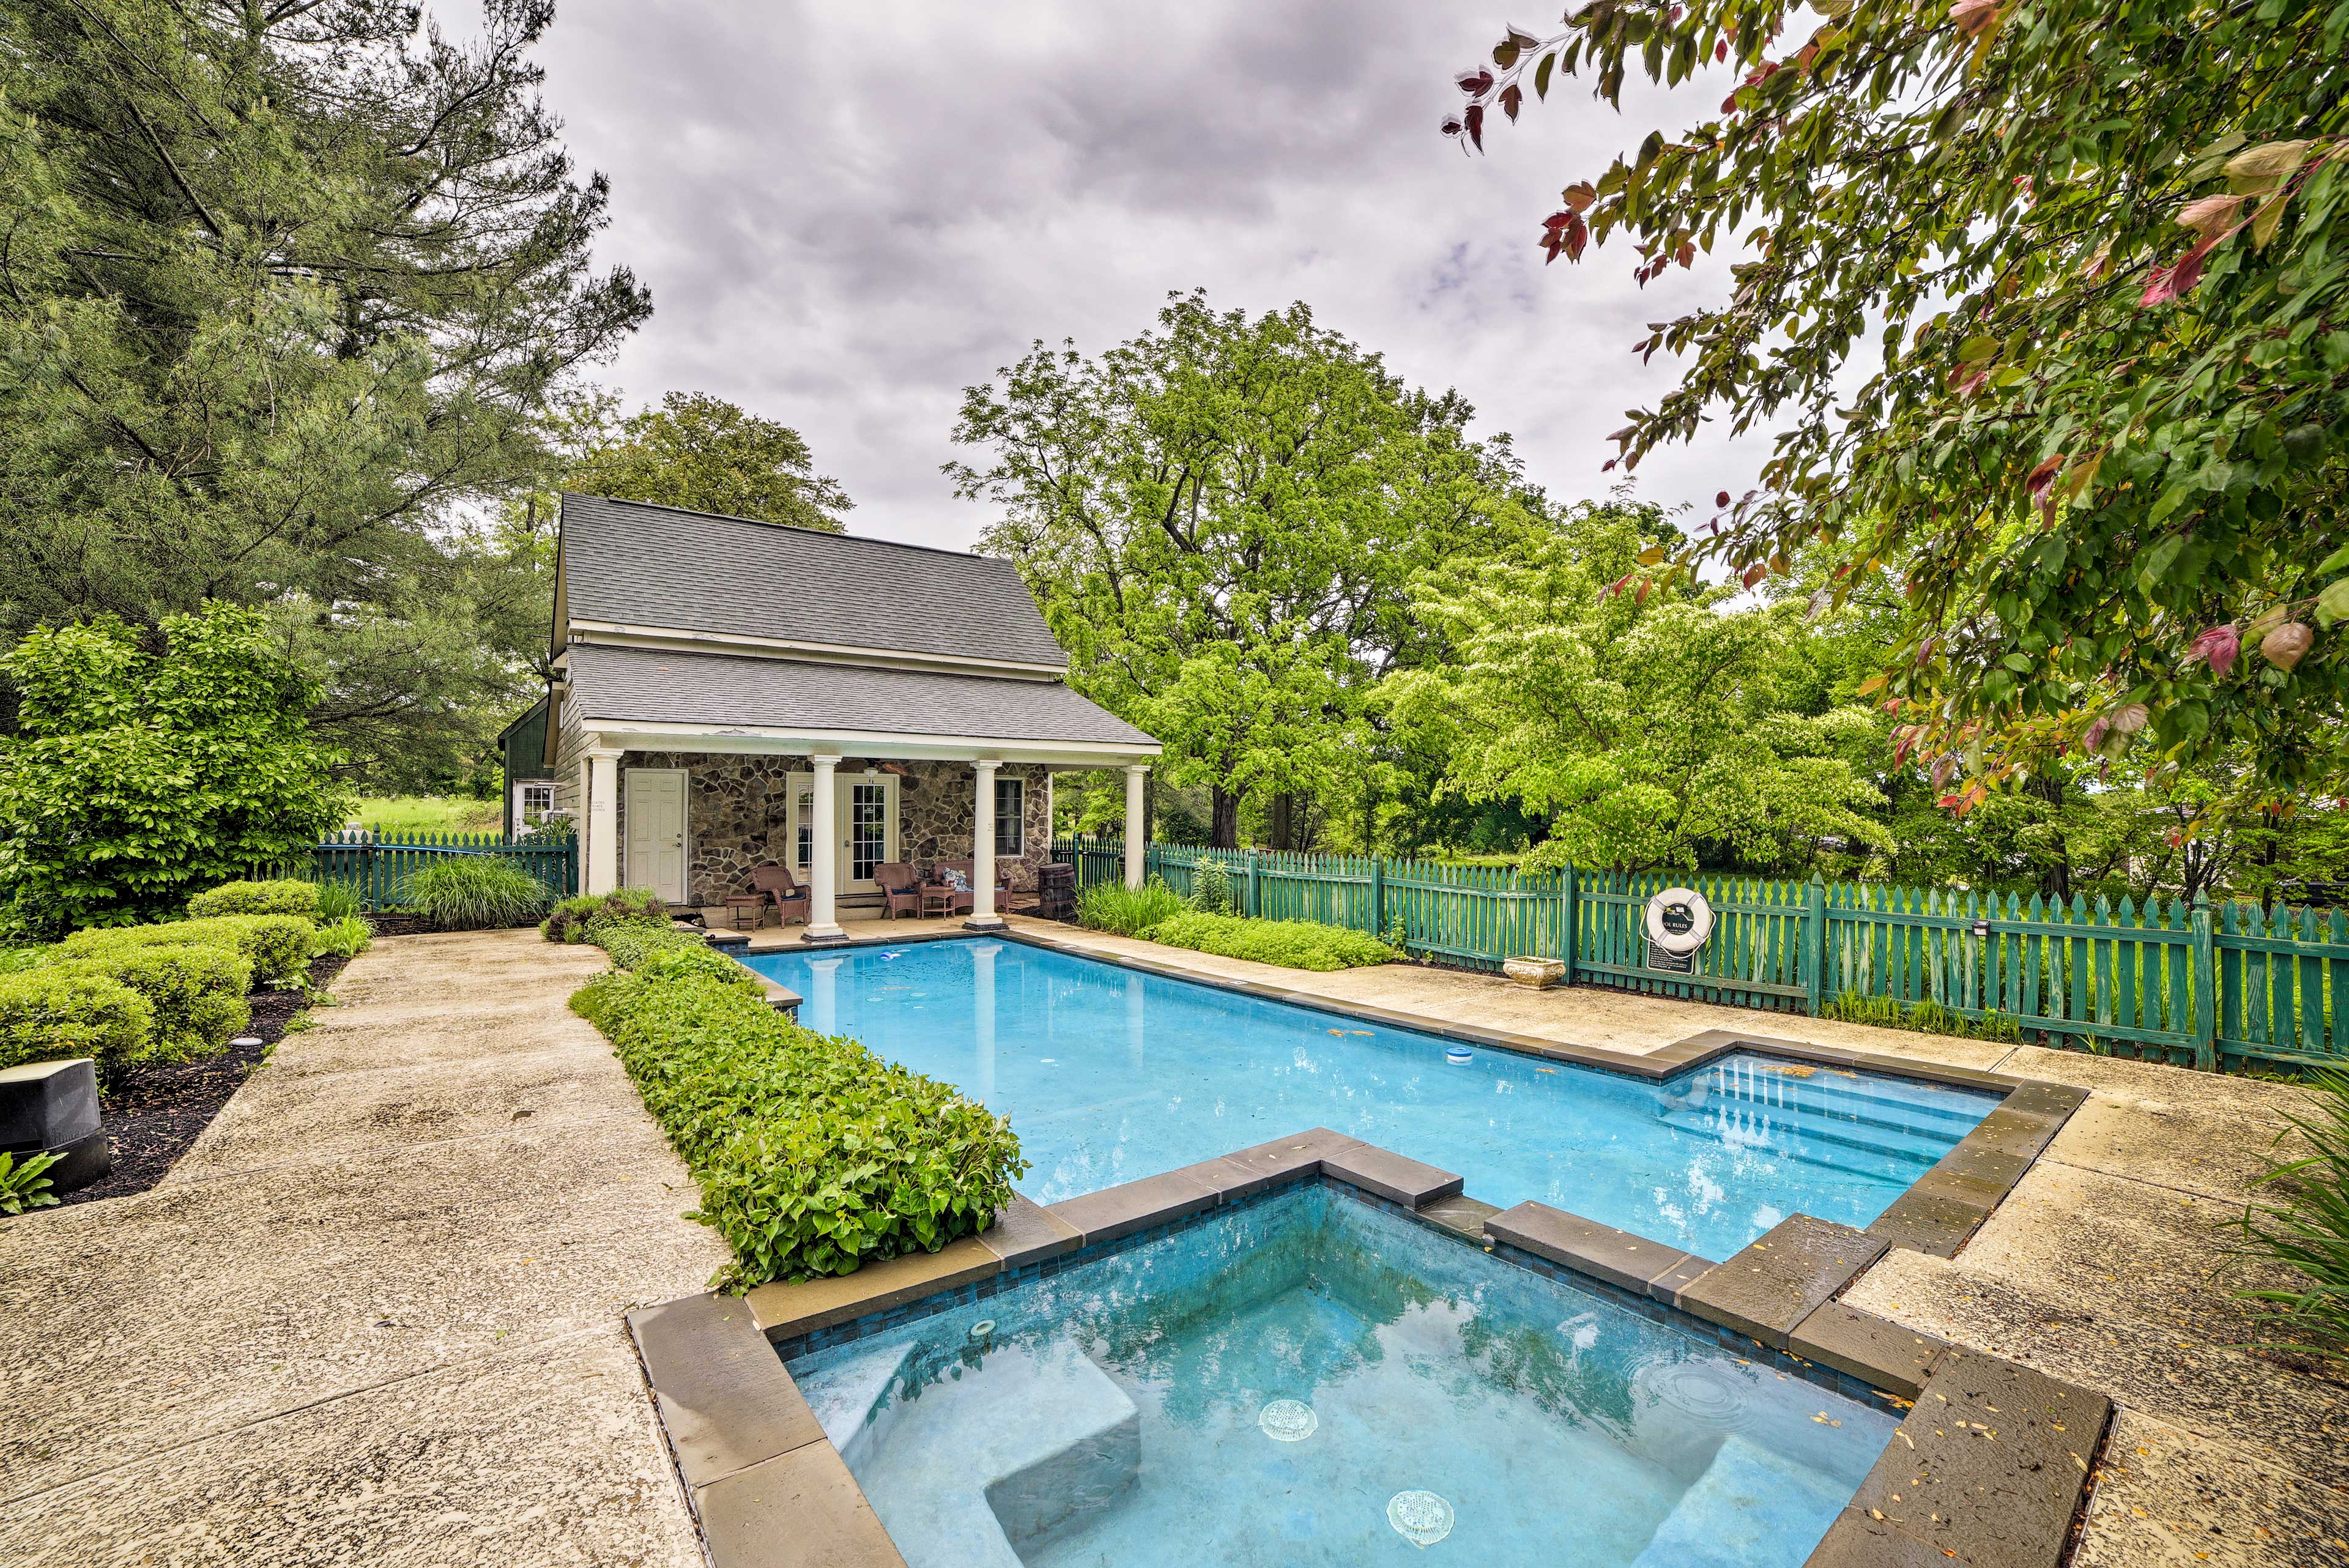 Hume Vacation Rental Villa | 6 Bedrooms | 6 Full Bathrooms | 2 Half Bathrooms